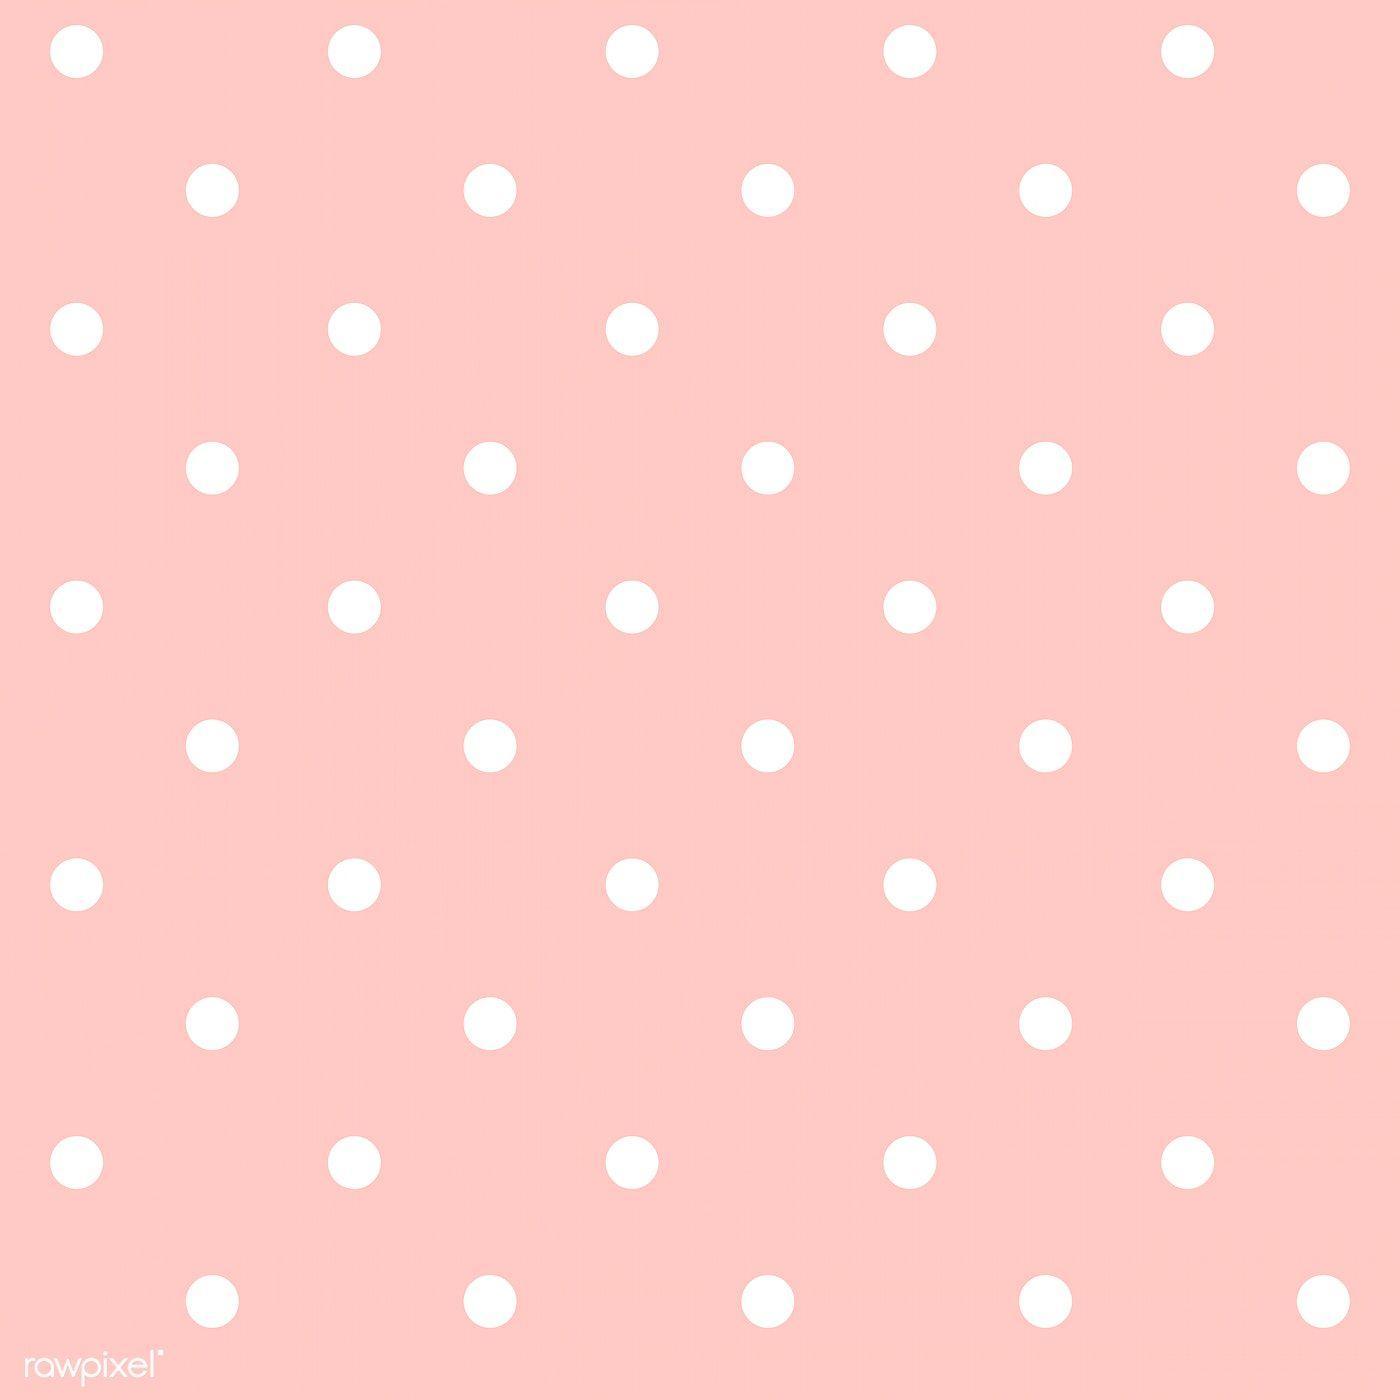 Pastel Pink And White Seamless Polka Dot Pattern Vector Free Image By Rawpixel Polka Dots Wallpaper Background Polka Dots Wallpaper Pink Polka Dots Wallpaper